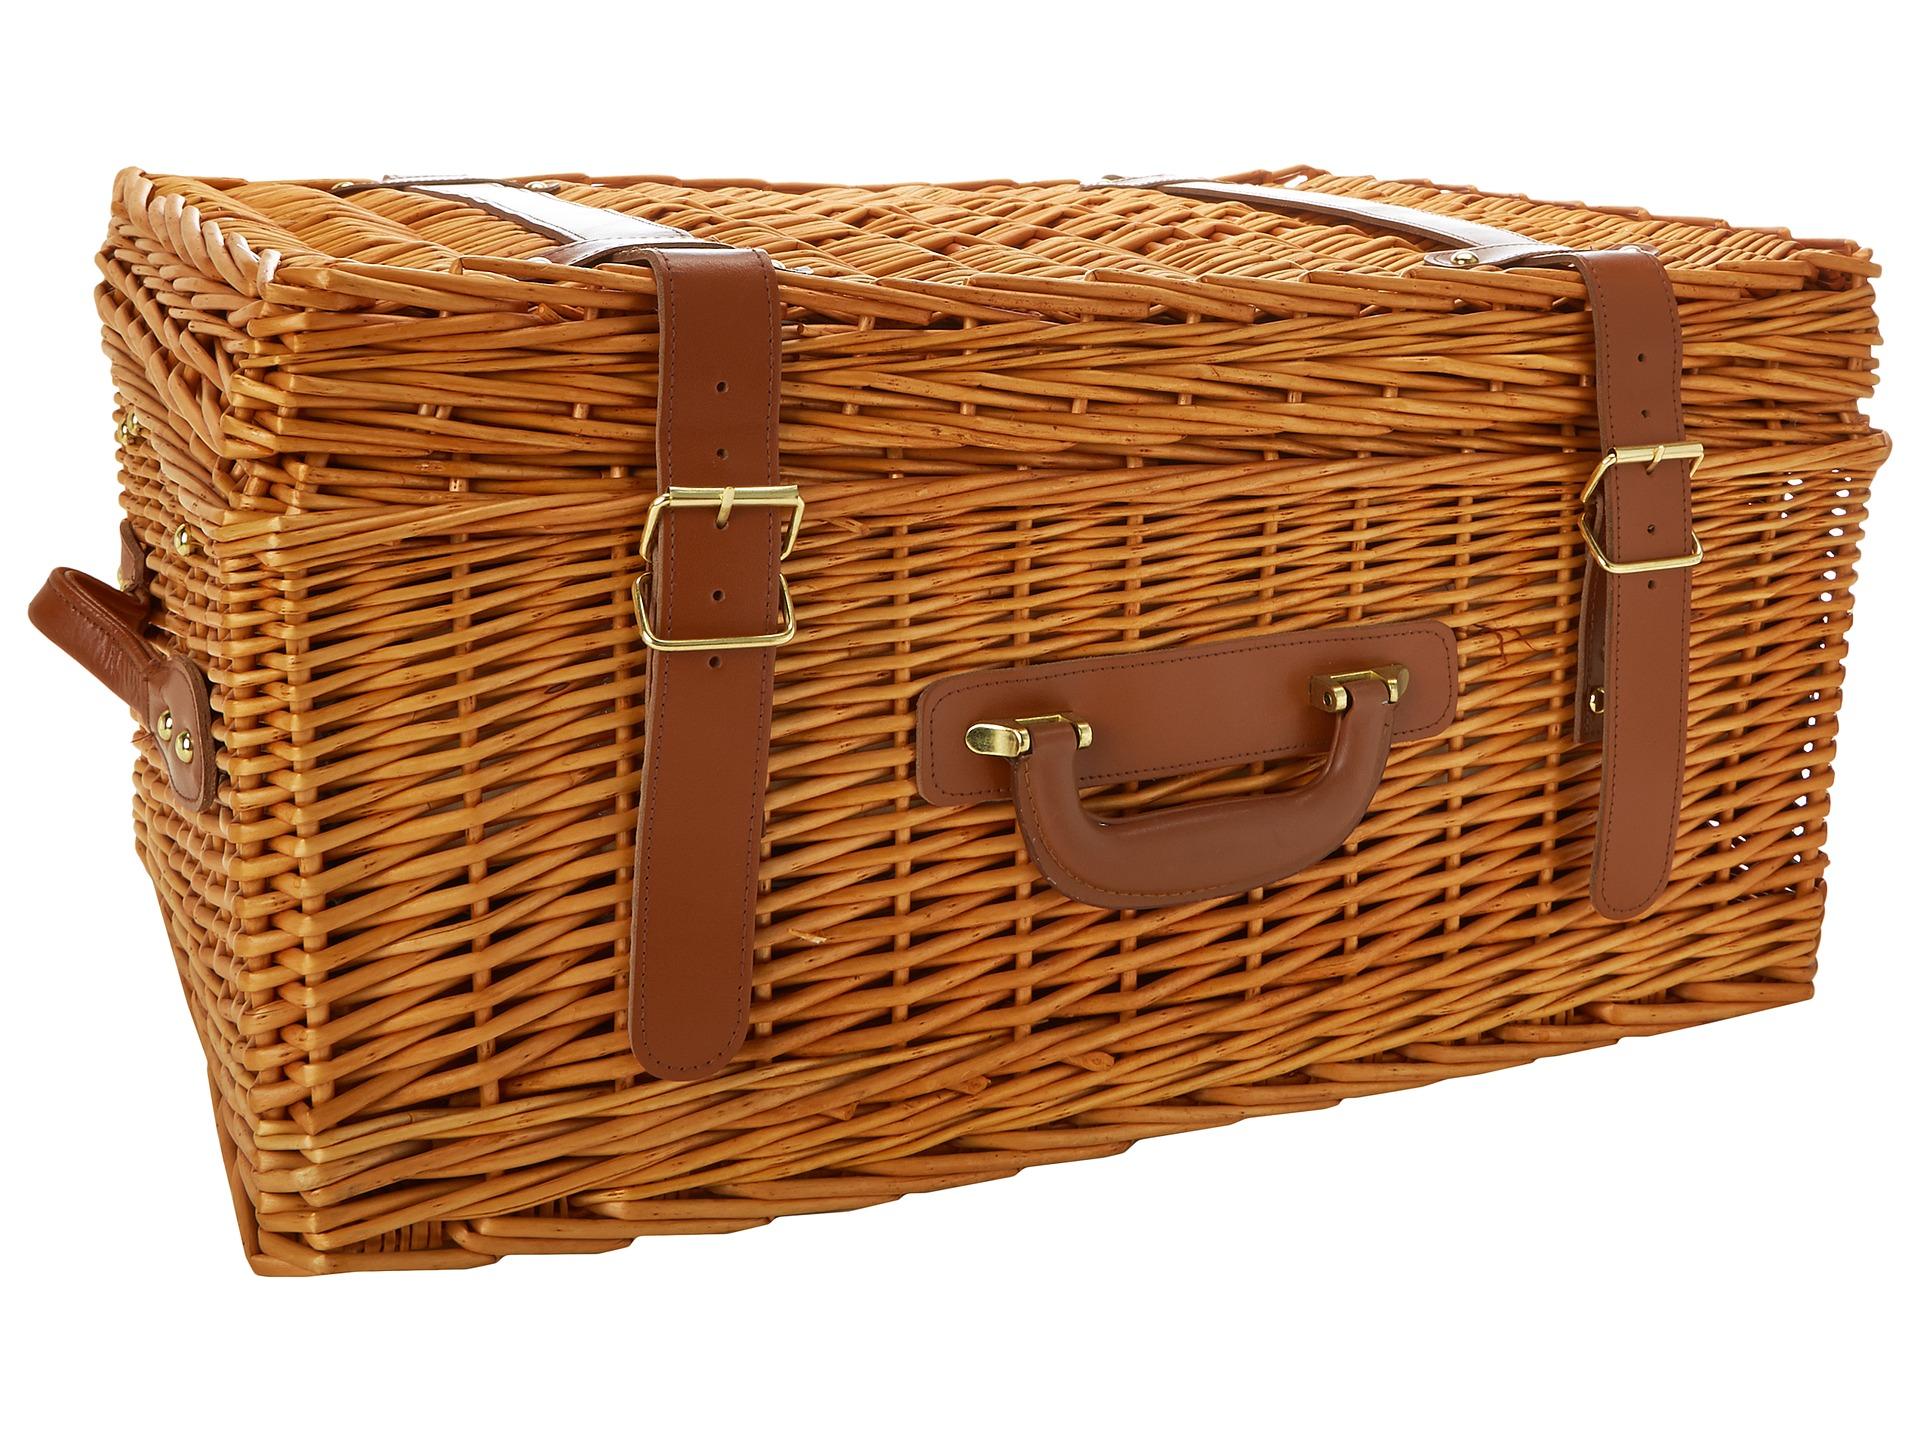 Windsor Picnic Basket For 4 : No results for picnic time windsor basket search